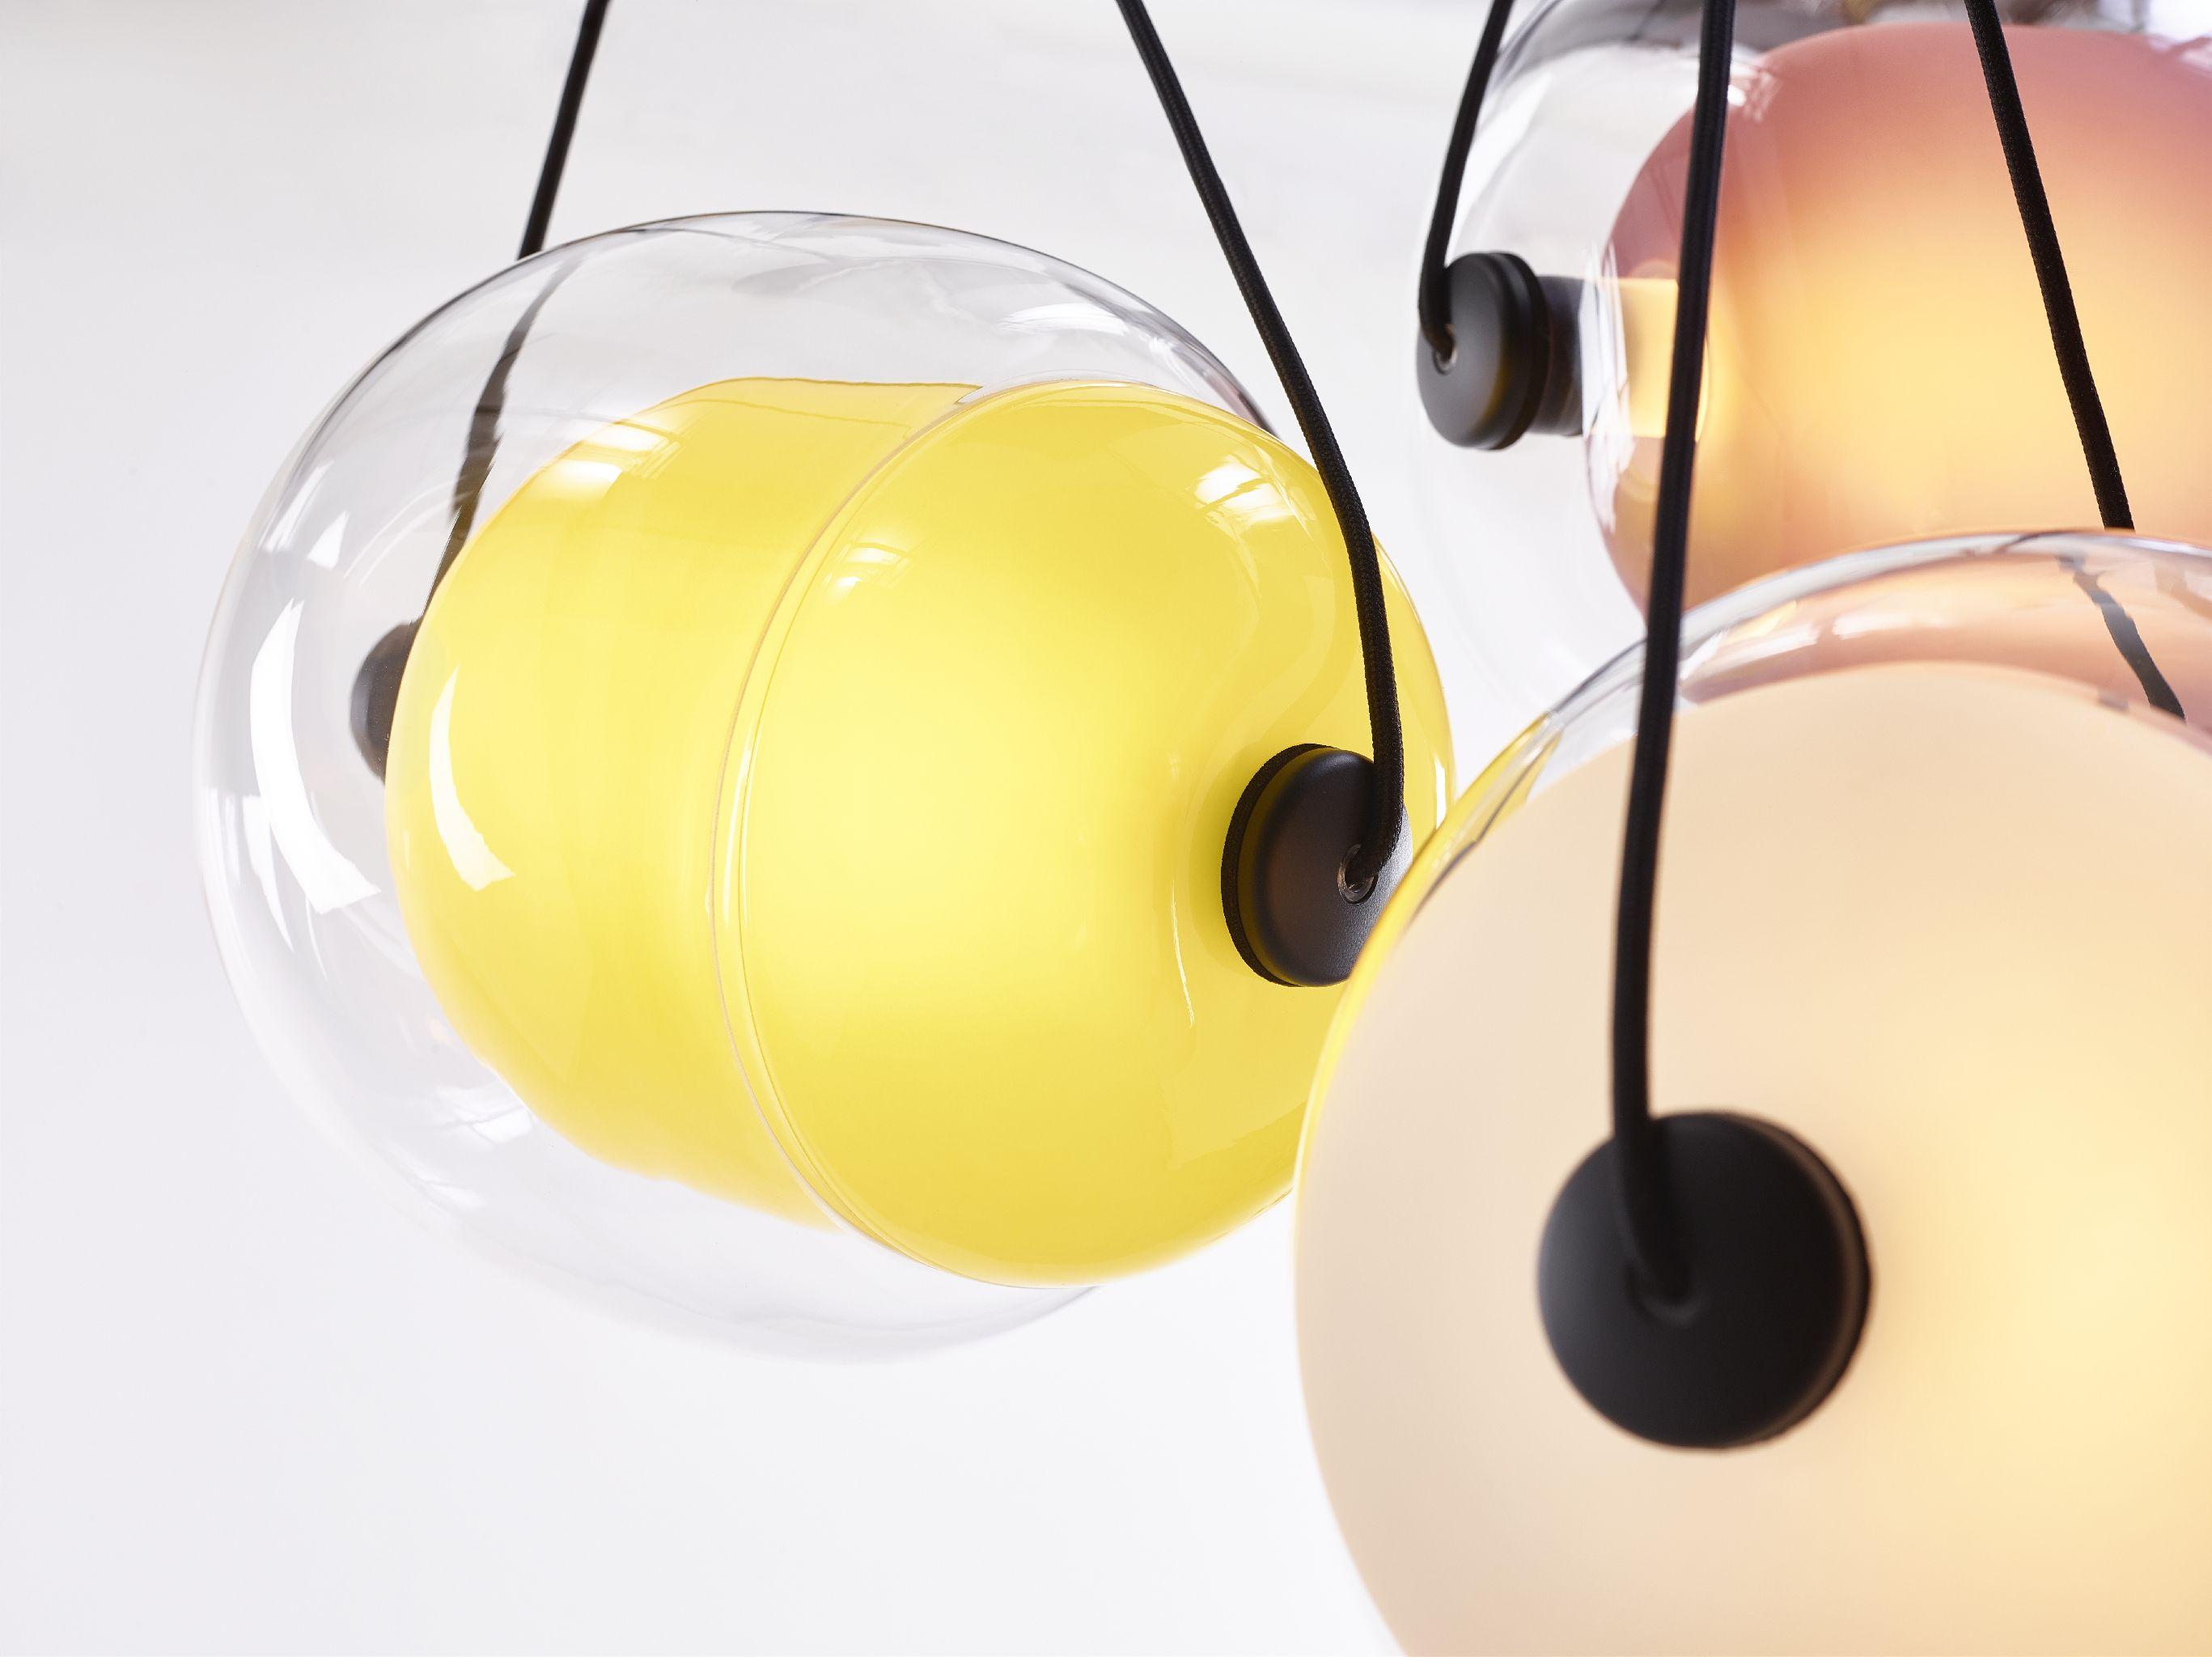 Brokis   Lights   Interior   Design. CAPSULA By Lucie Koldova.